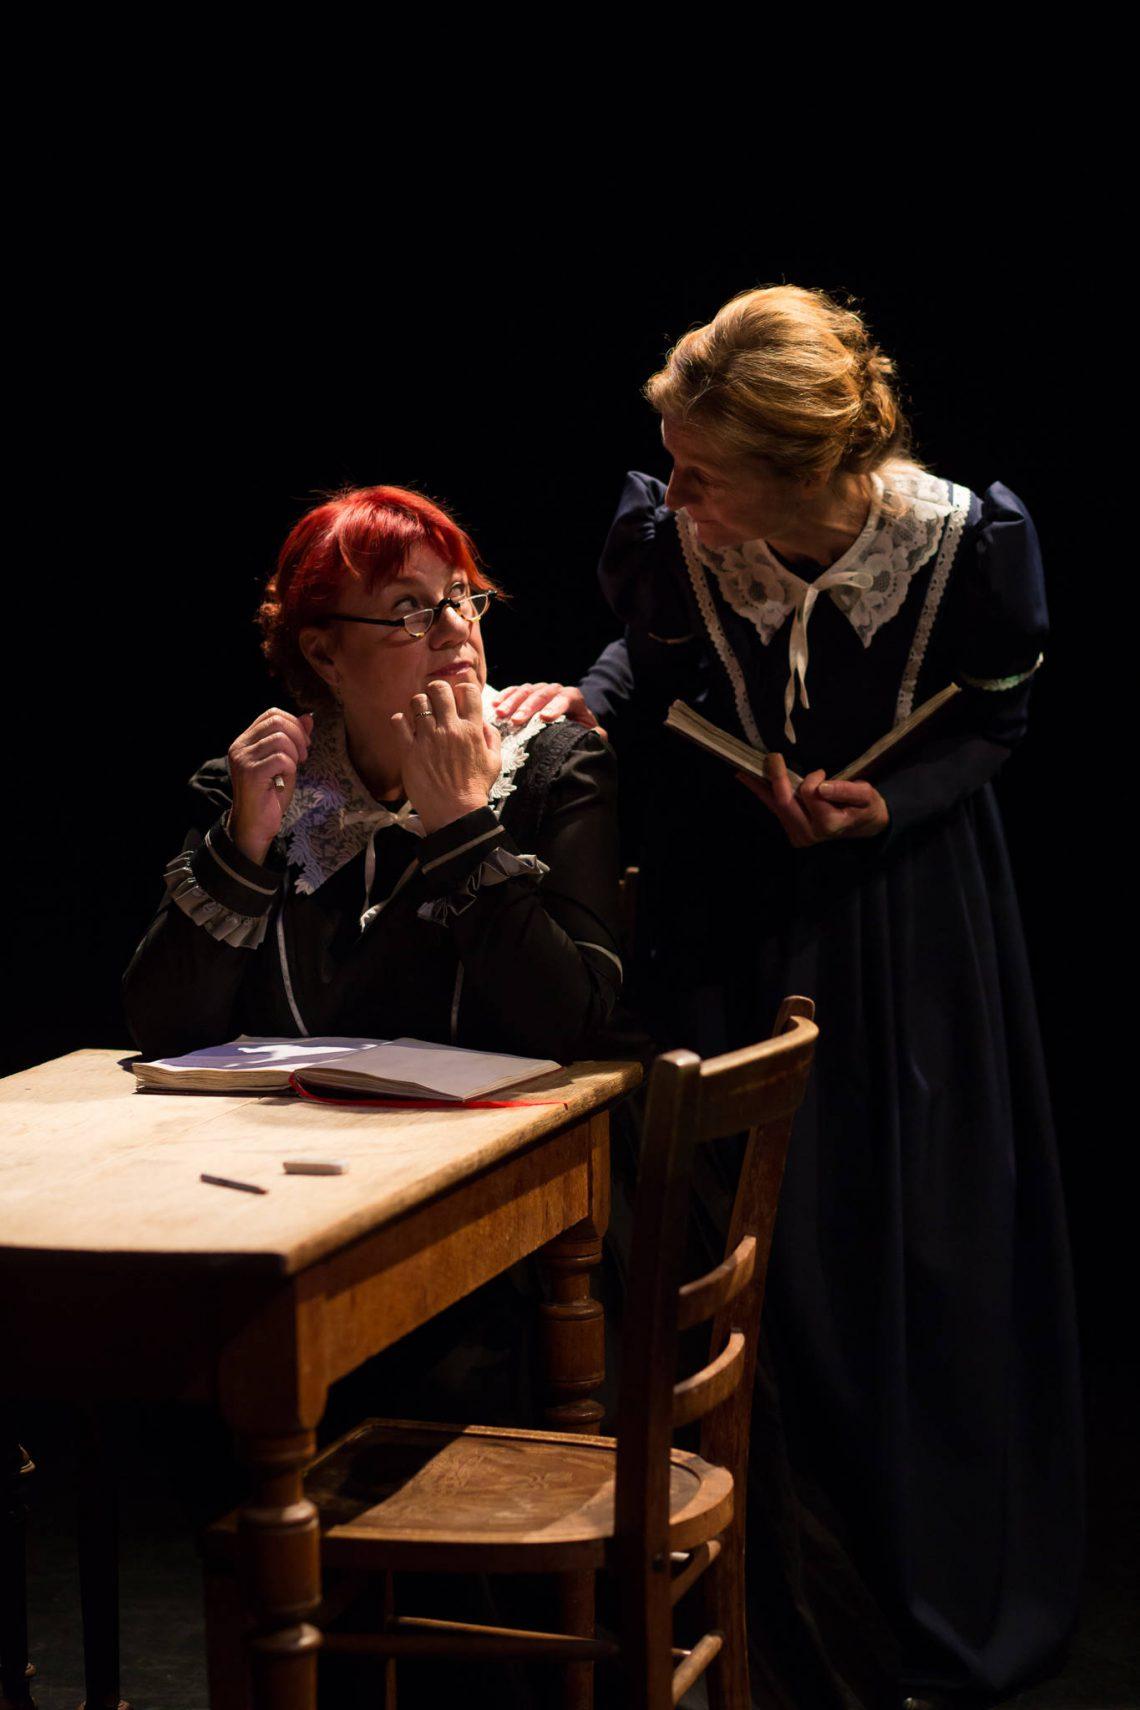 Brontë Schwestern - Angst